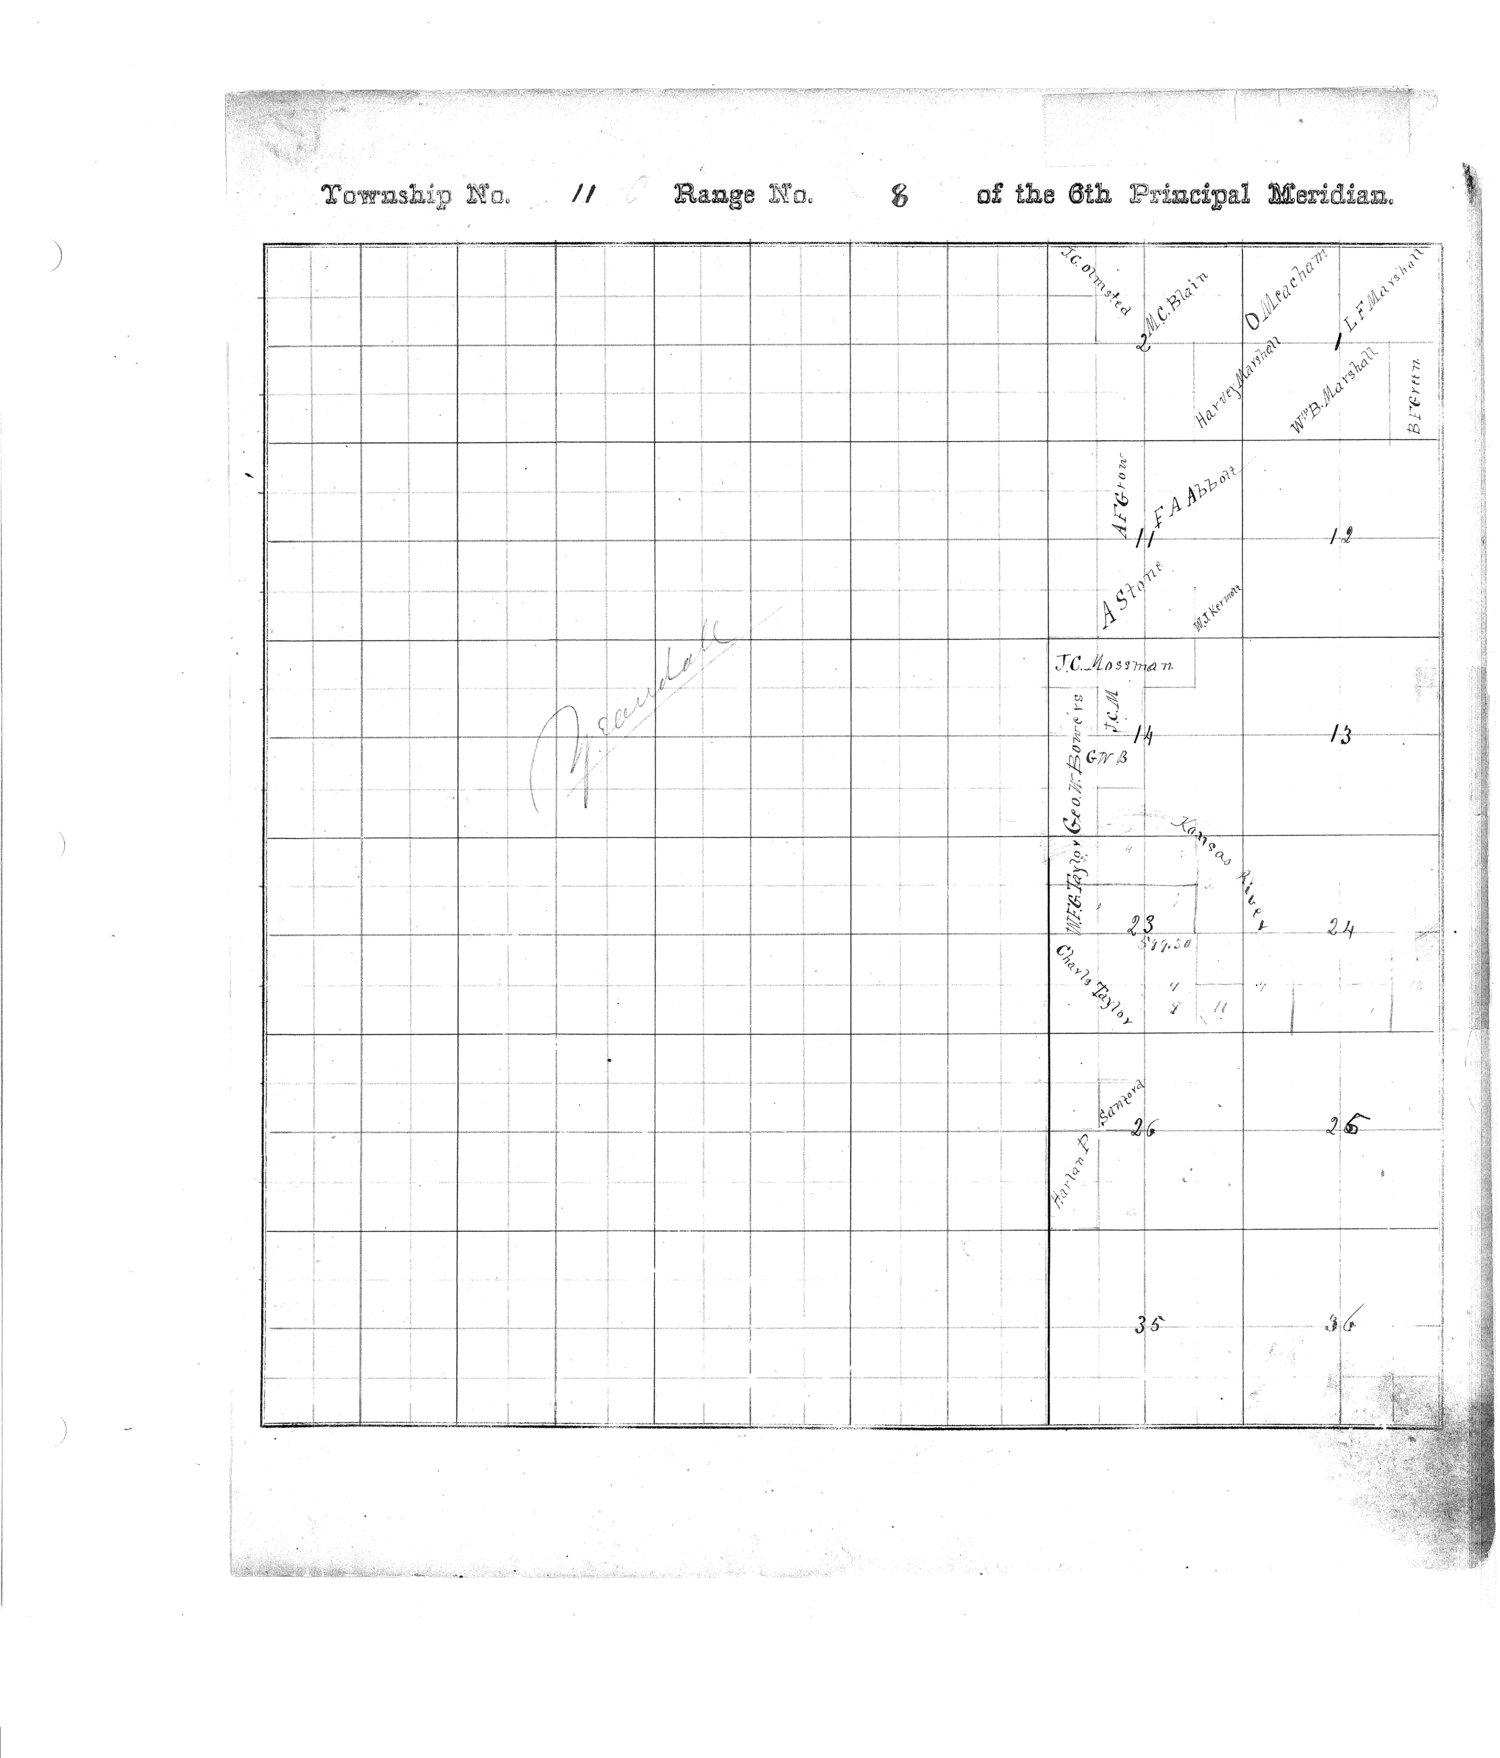 Richardson County and Wabaunsee County, Kansas, survey - 2